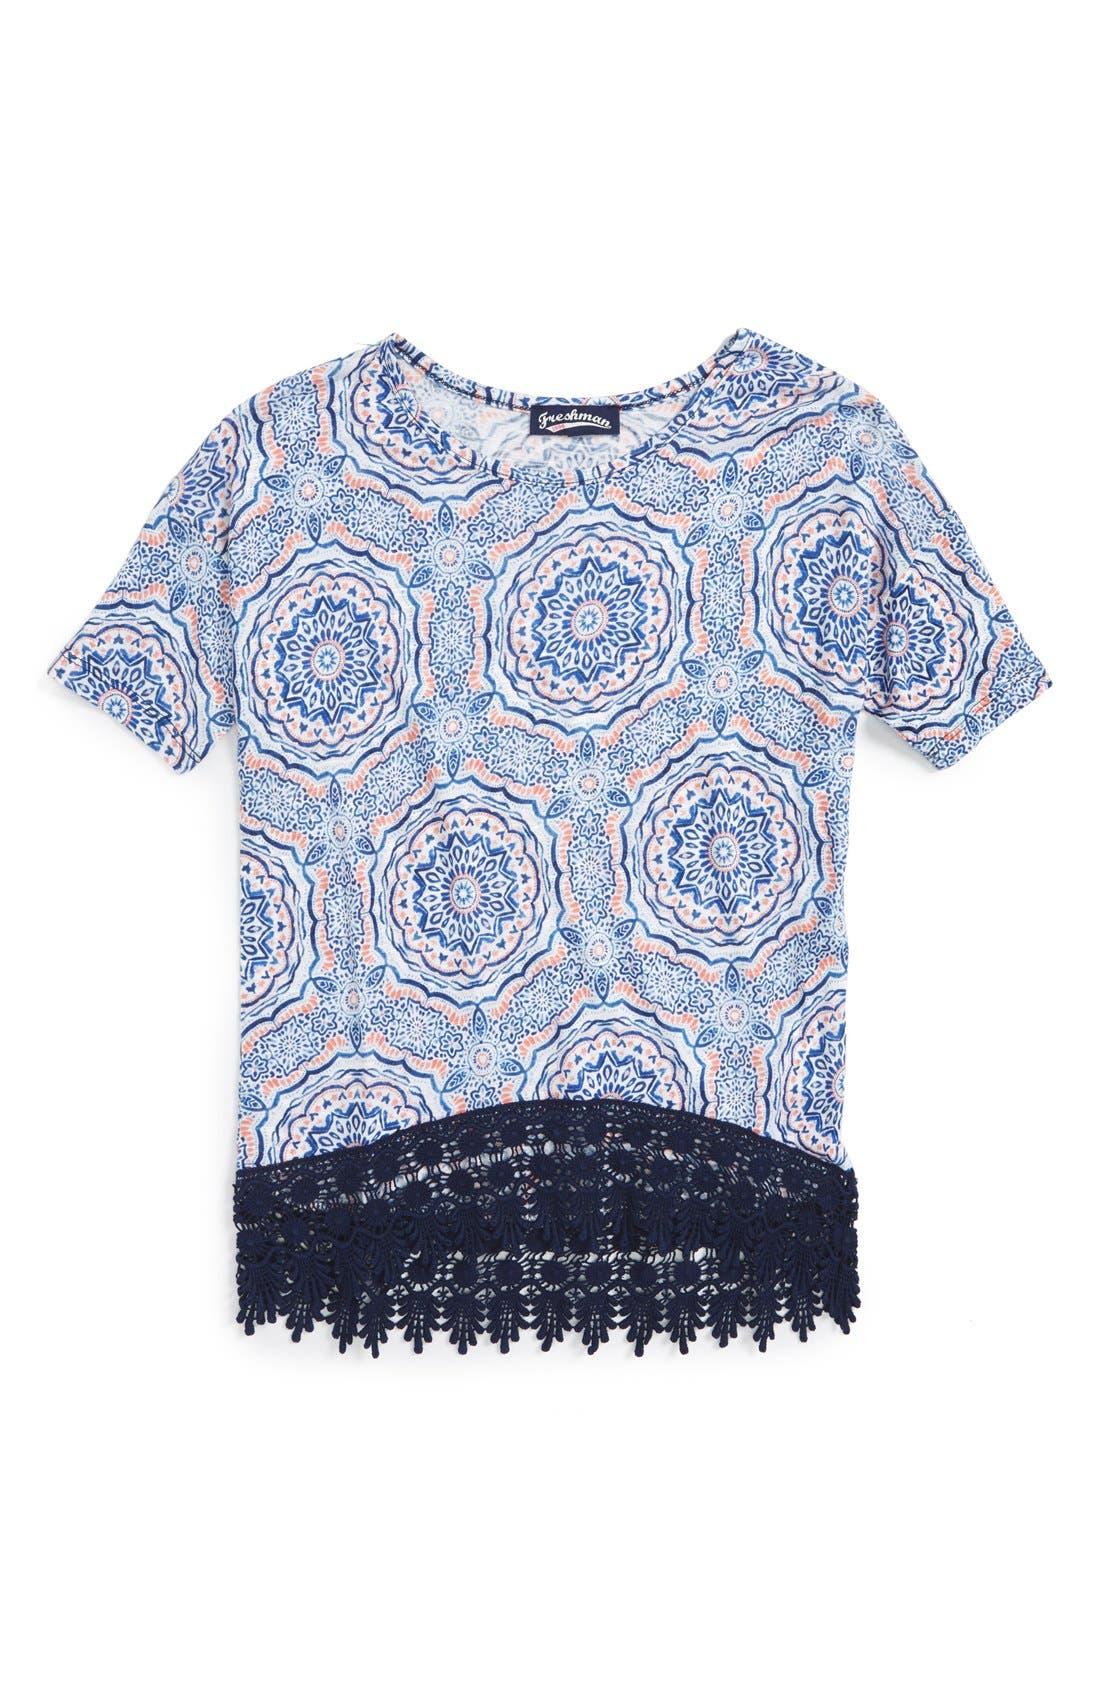 Alternate Image 1 Selected - Freshman Print Crochet Trim Tee (Big Girls)